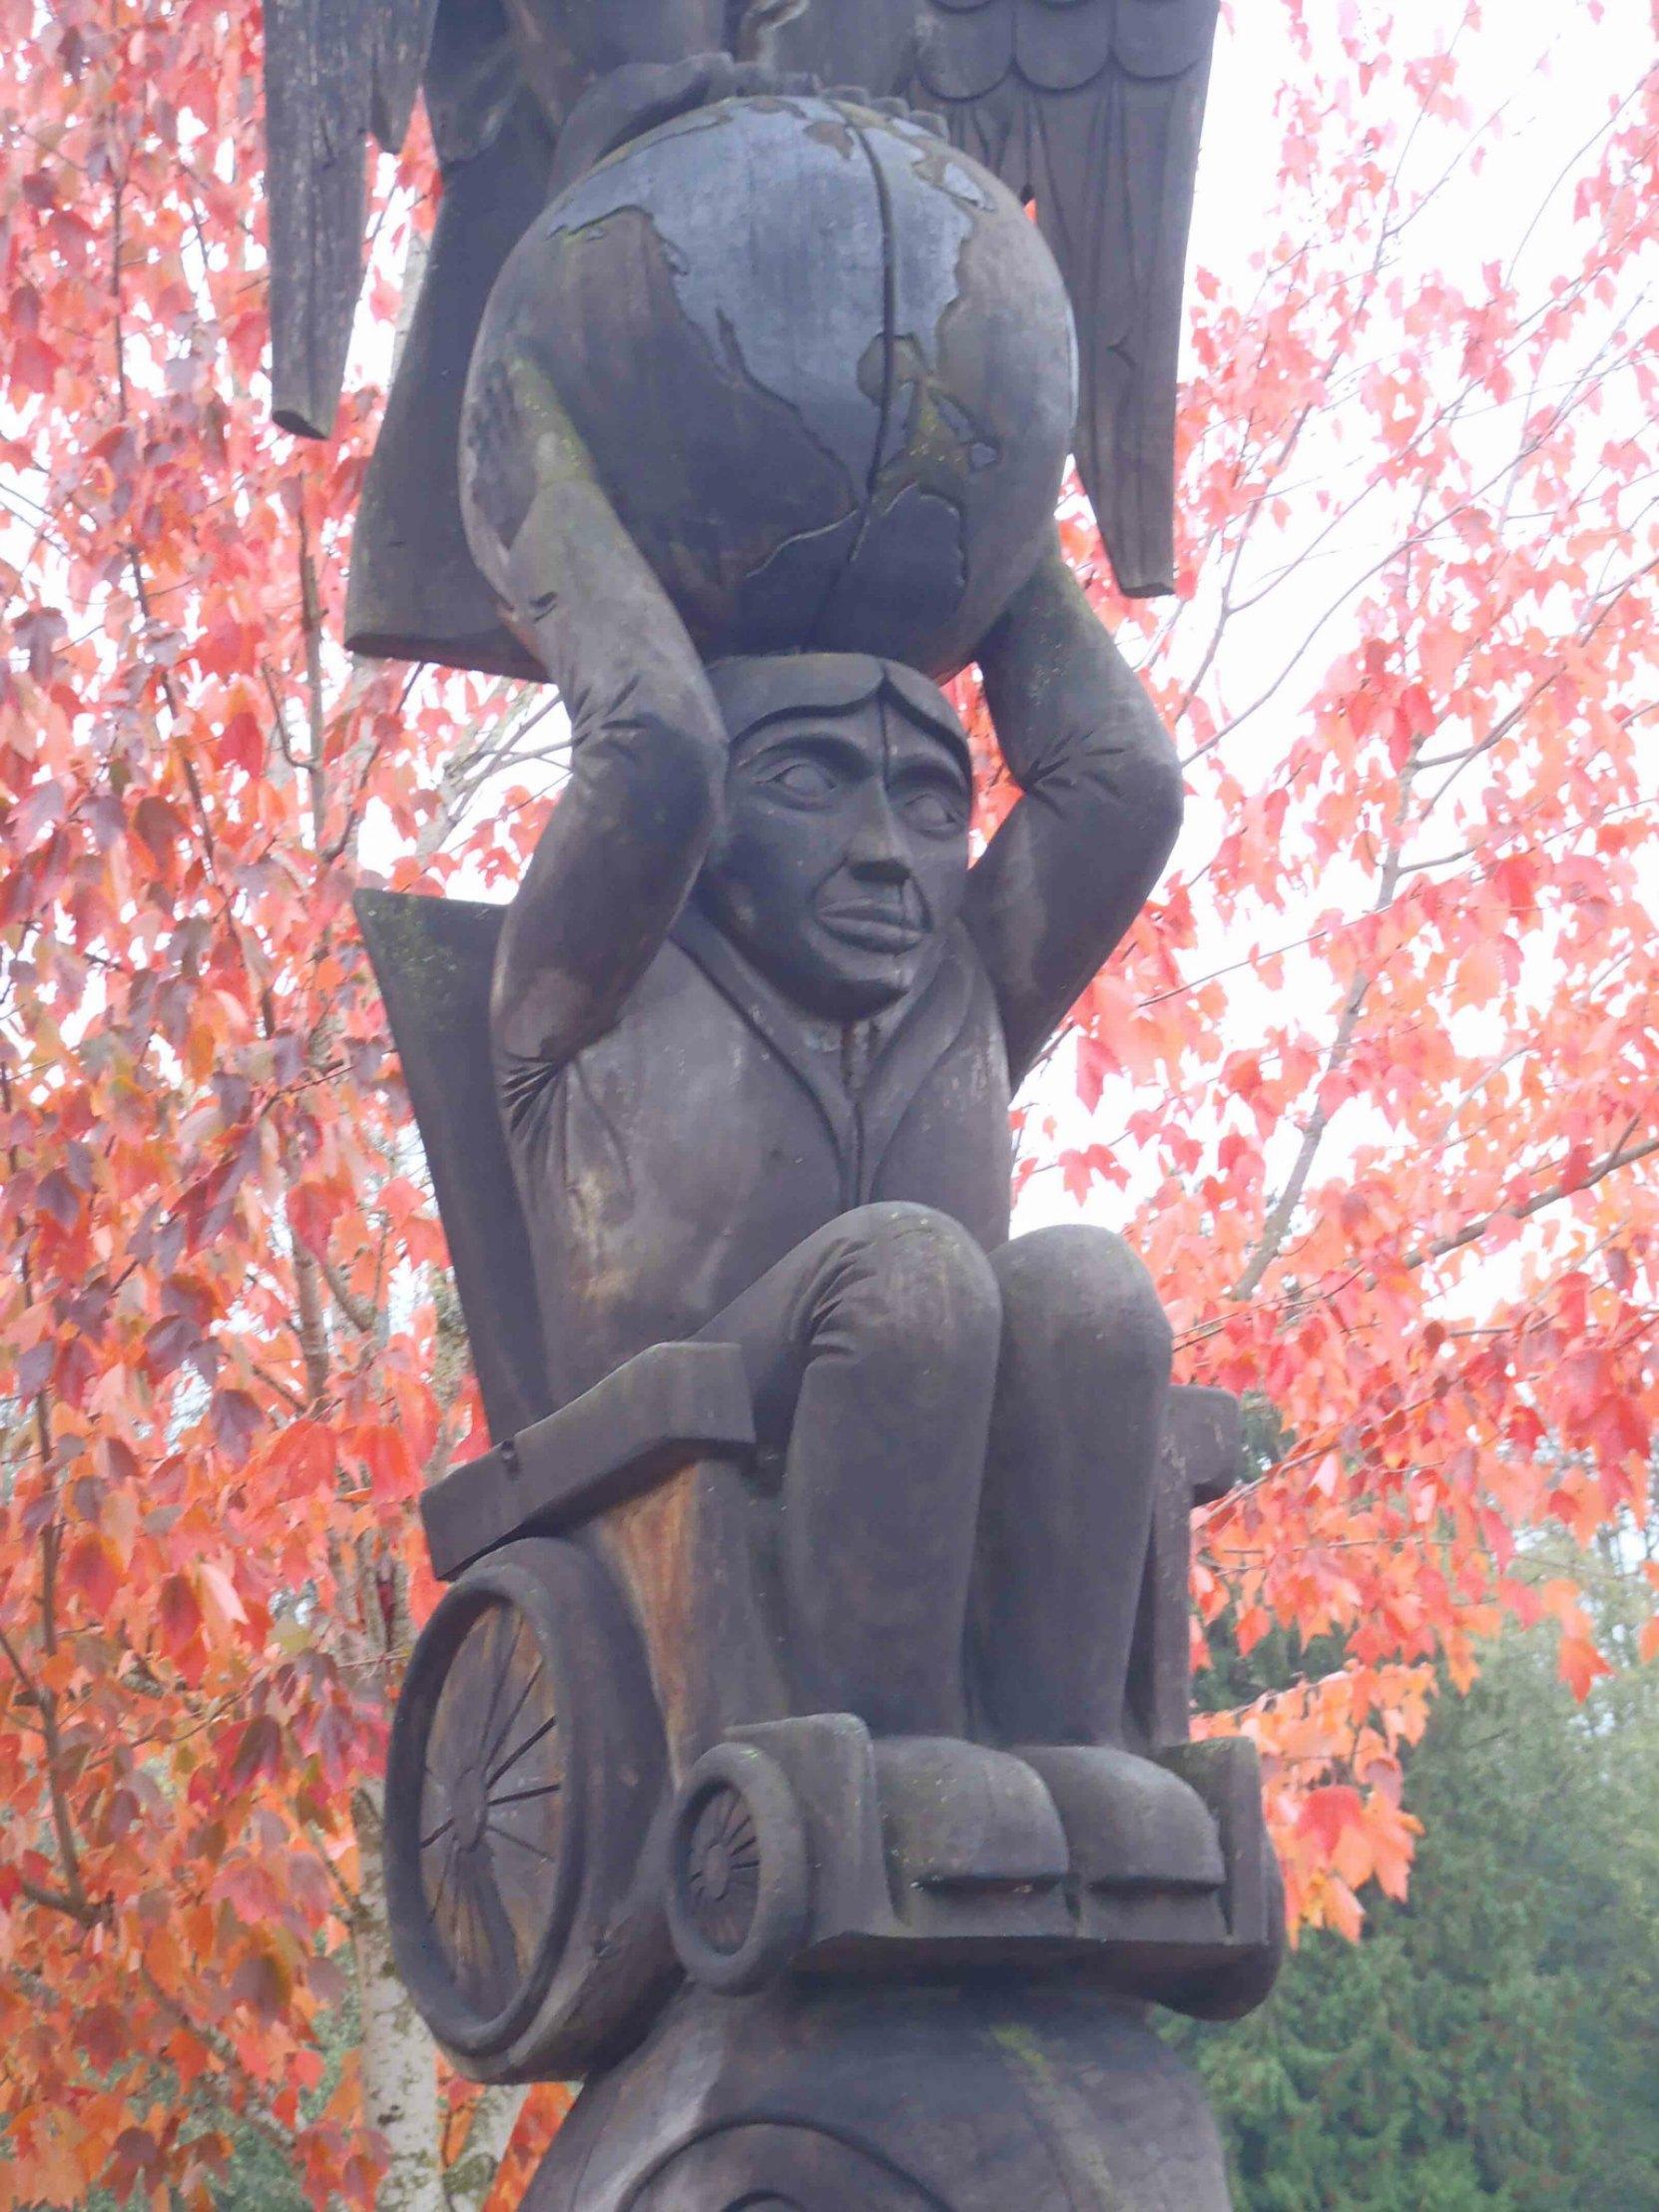 Rick Hansen Man In Motion totem pole, Centennial Park, Duncan, B.C.